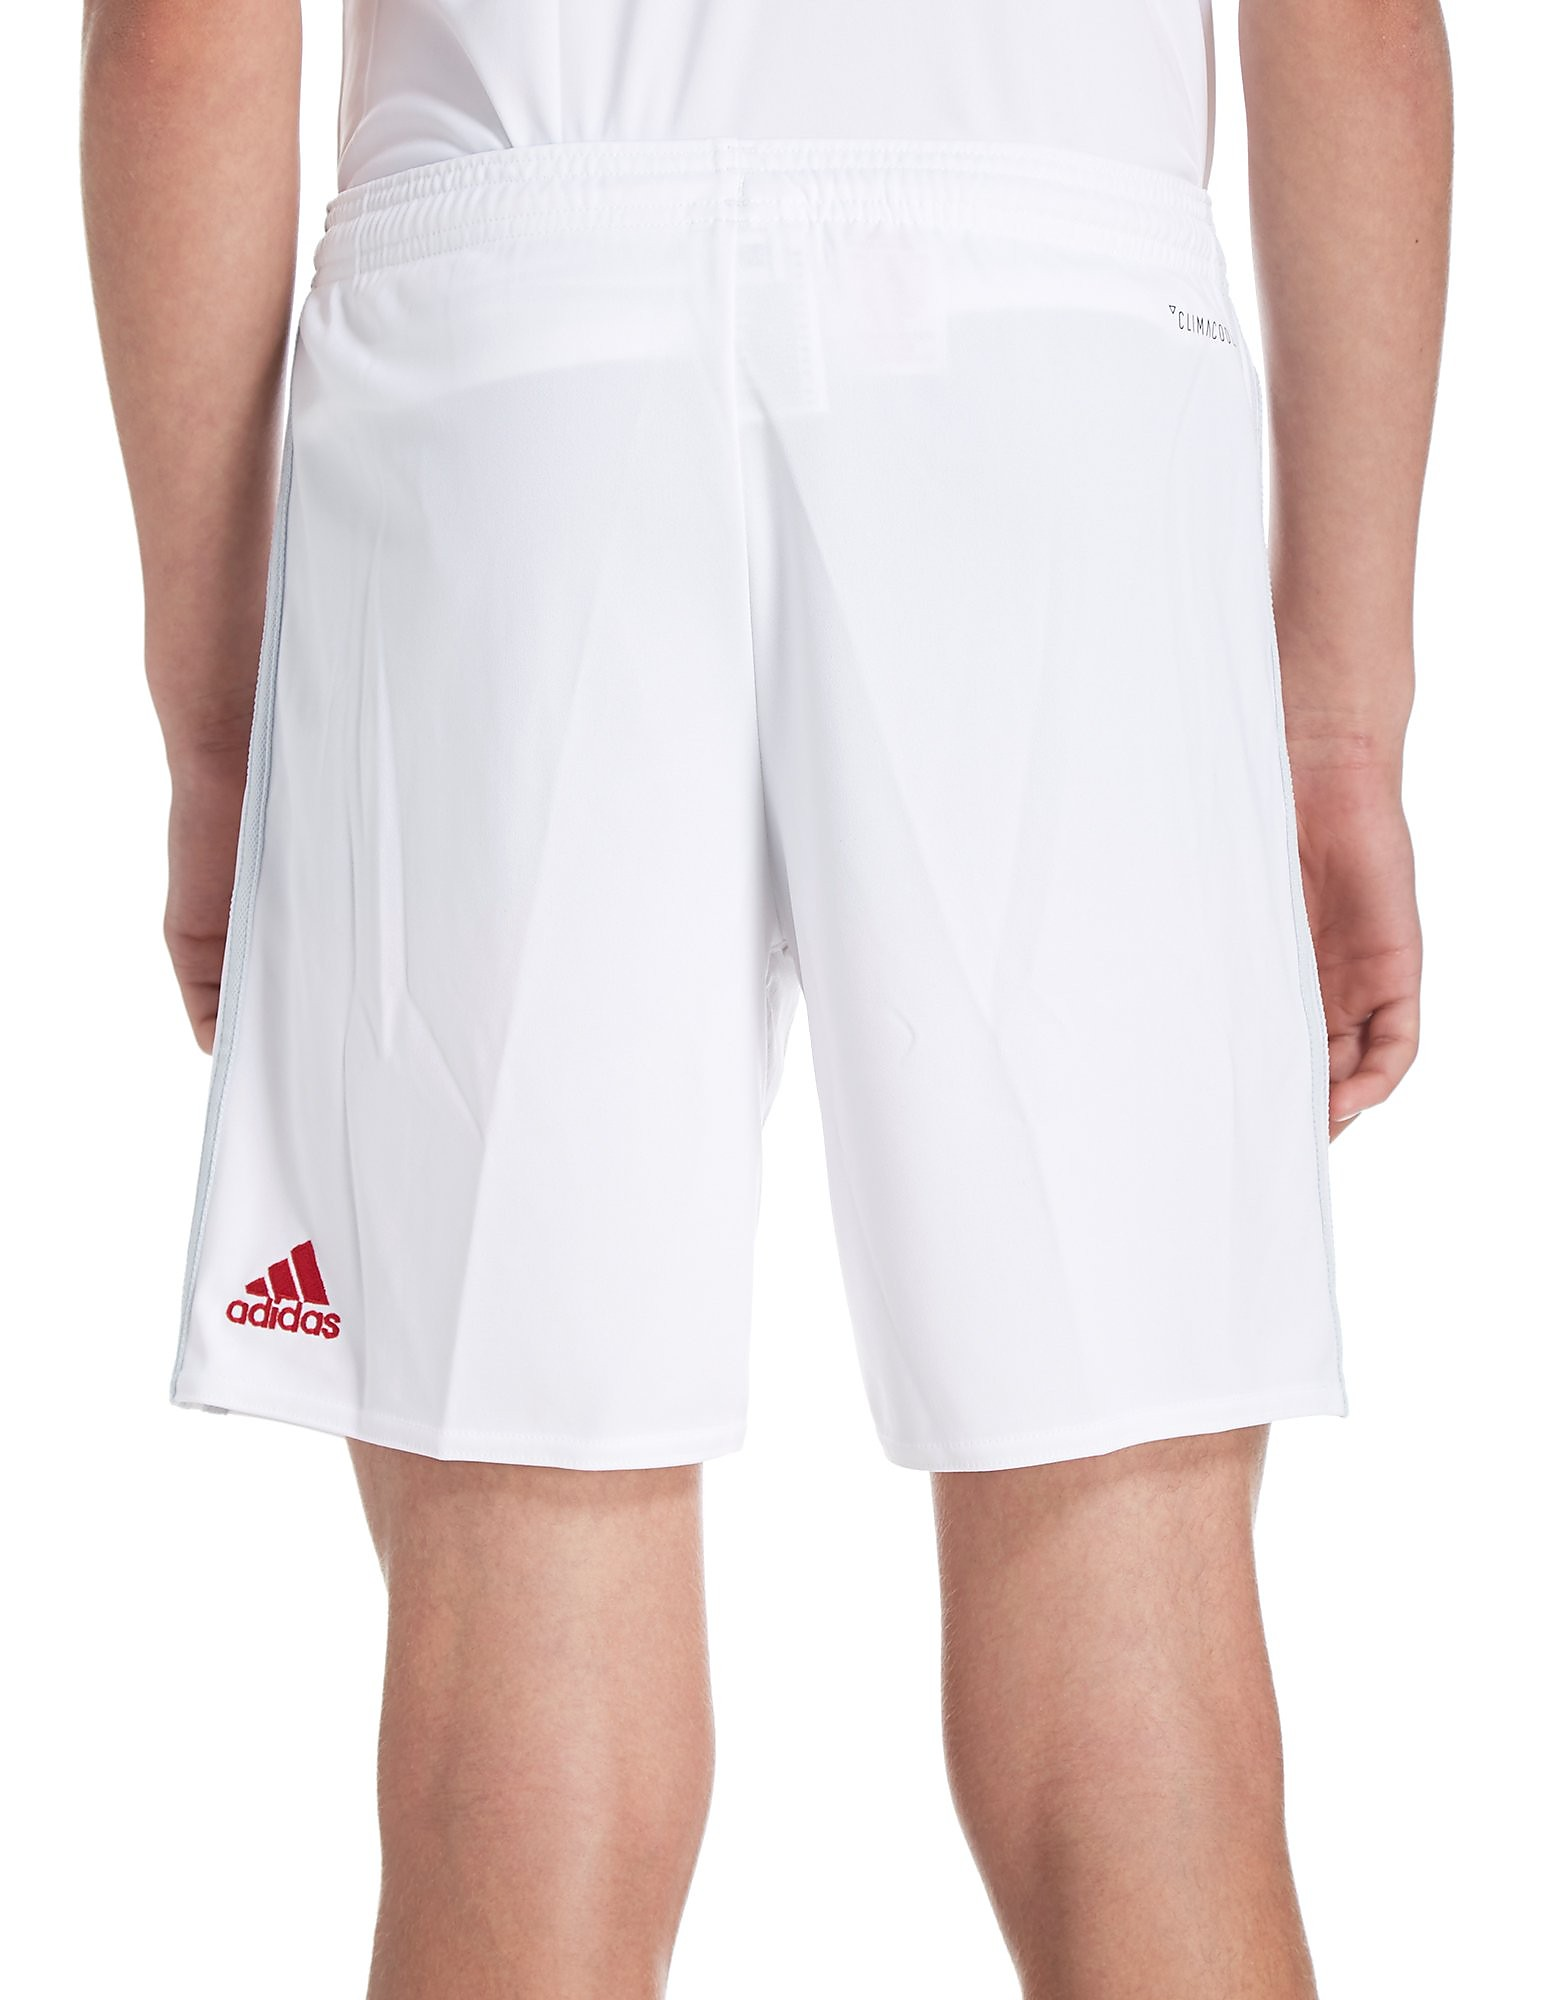 adidas Ajax 2017/18 Home Shorts Junior